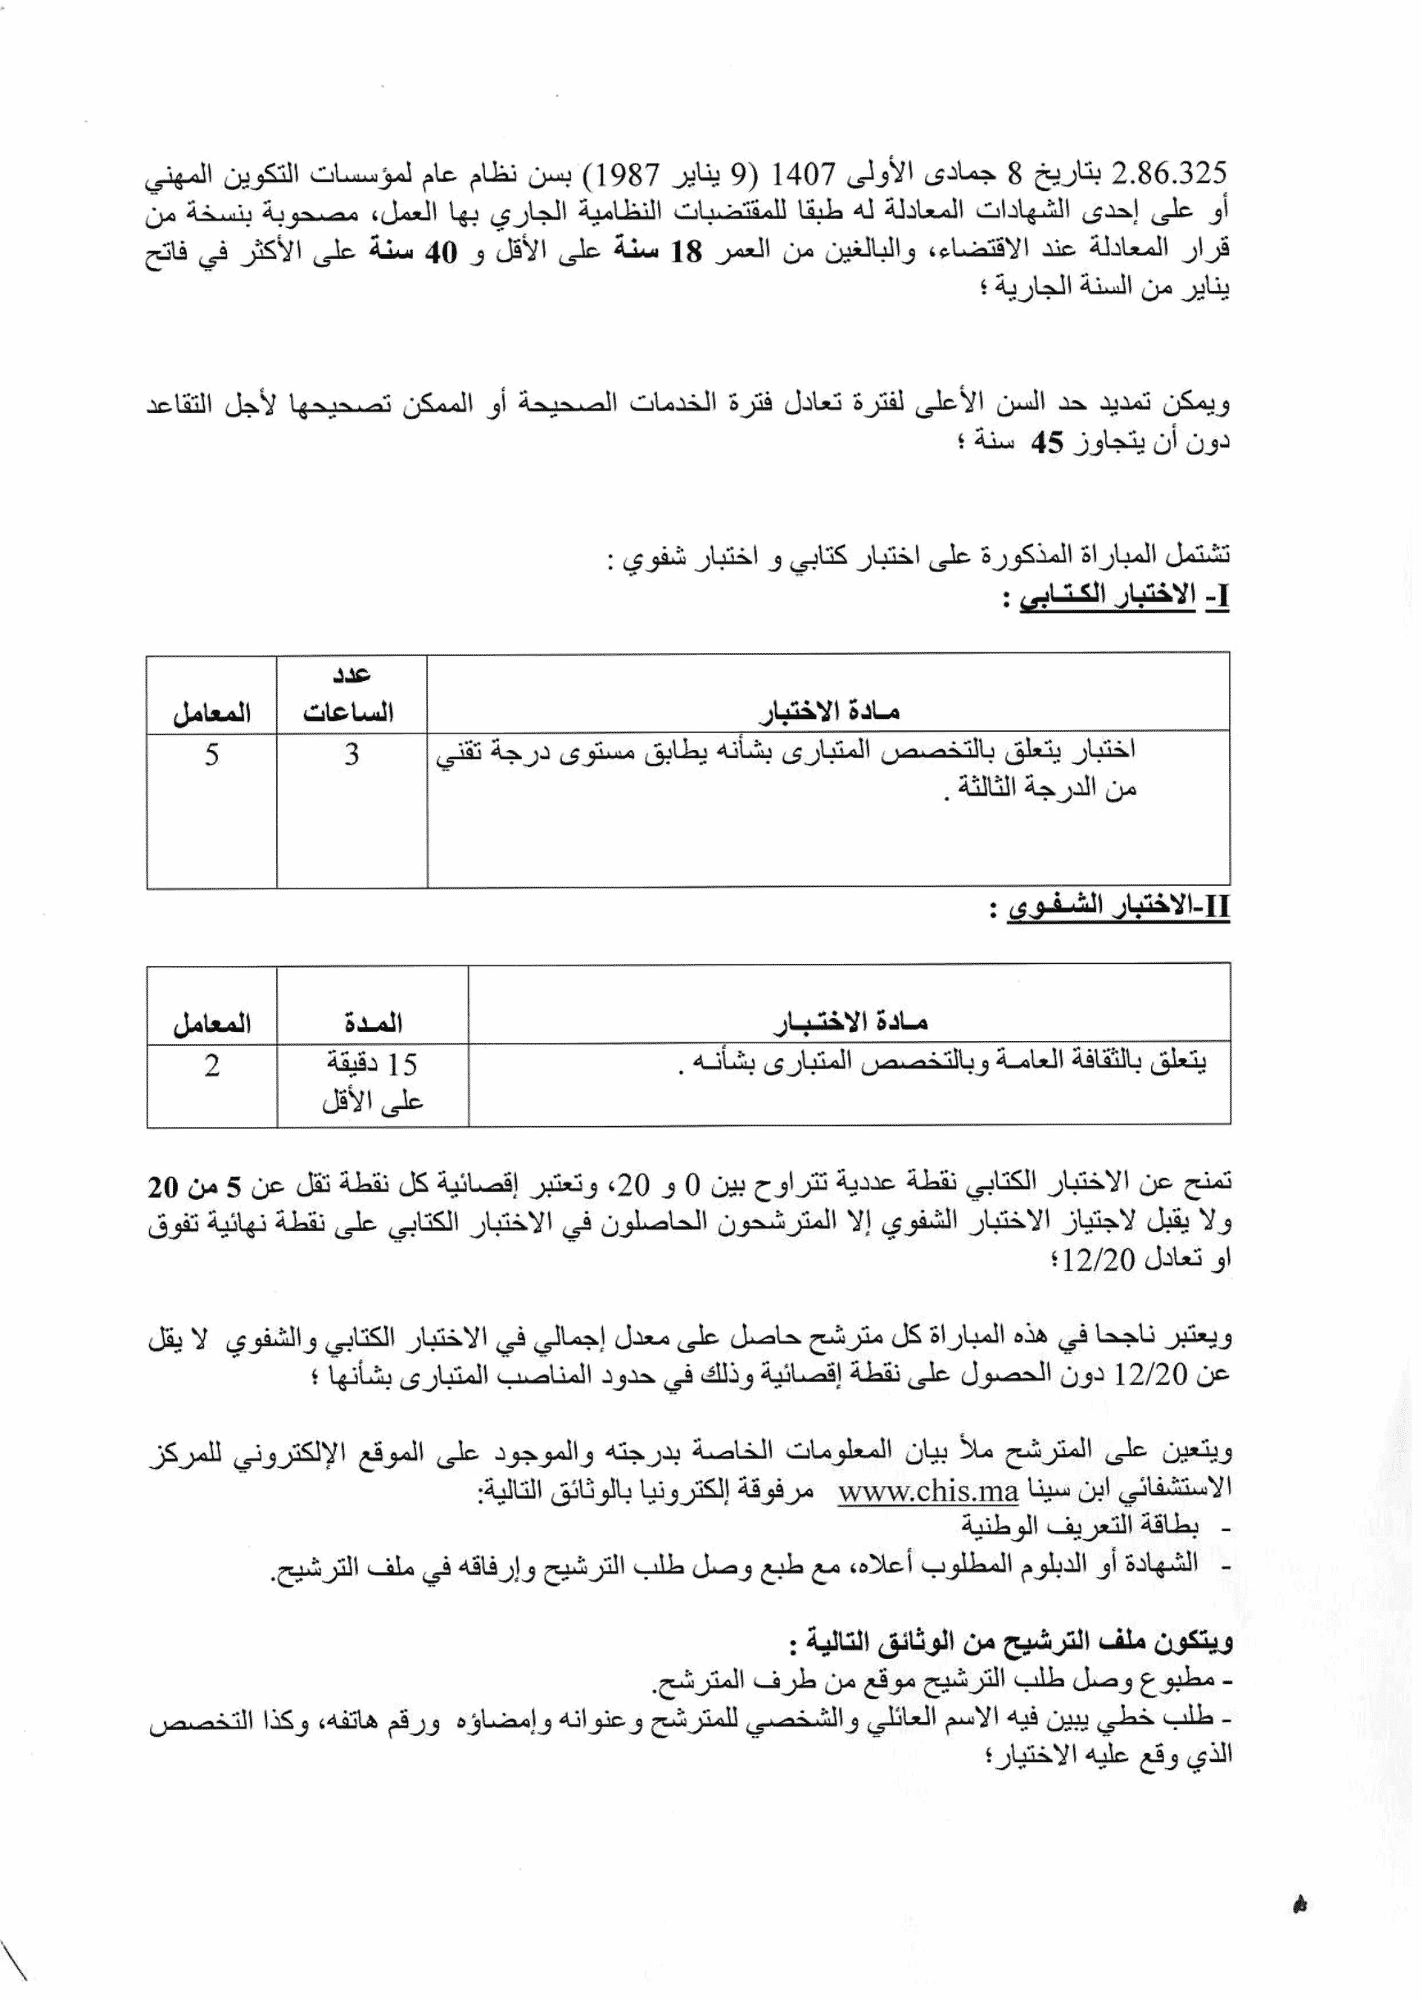 2 Concours CHU Ibn Sina 2021 (100 Postes)